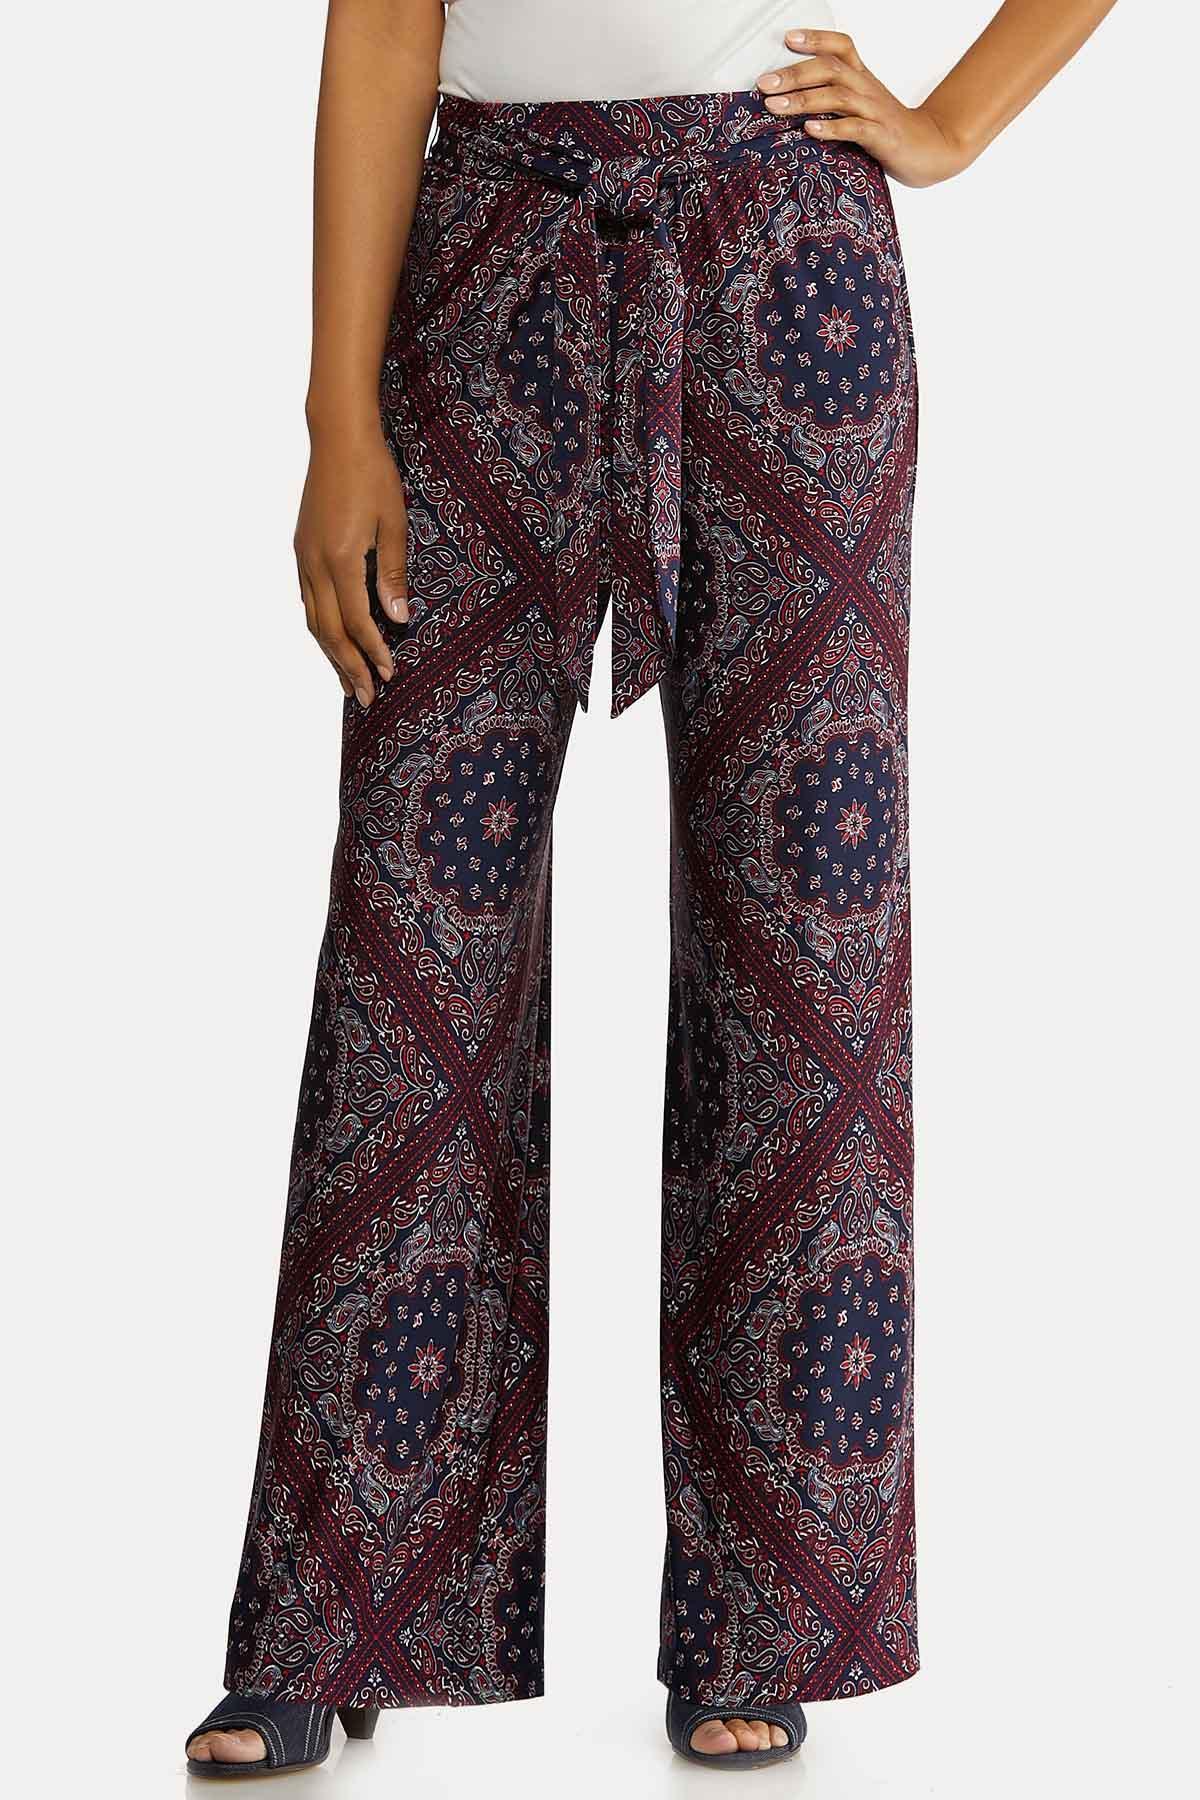 Petite Moroccan Tie Front Pants